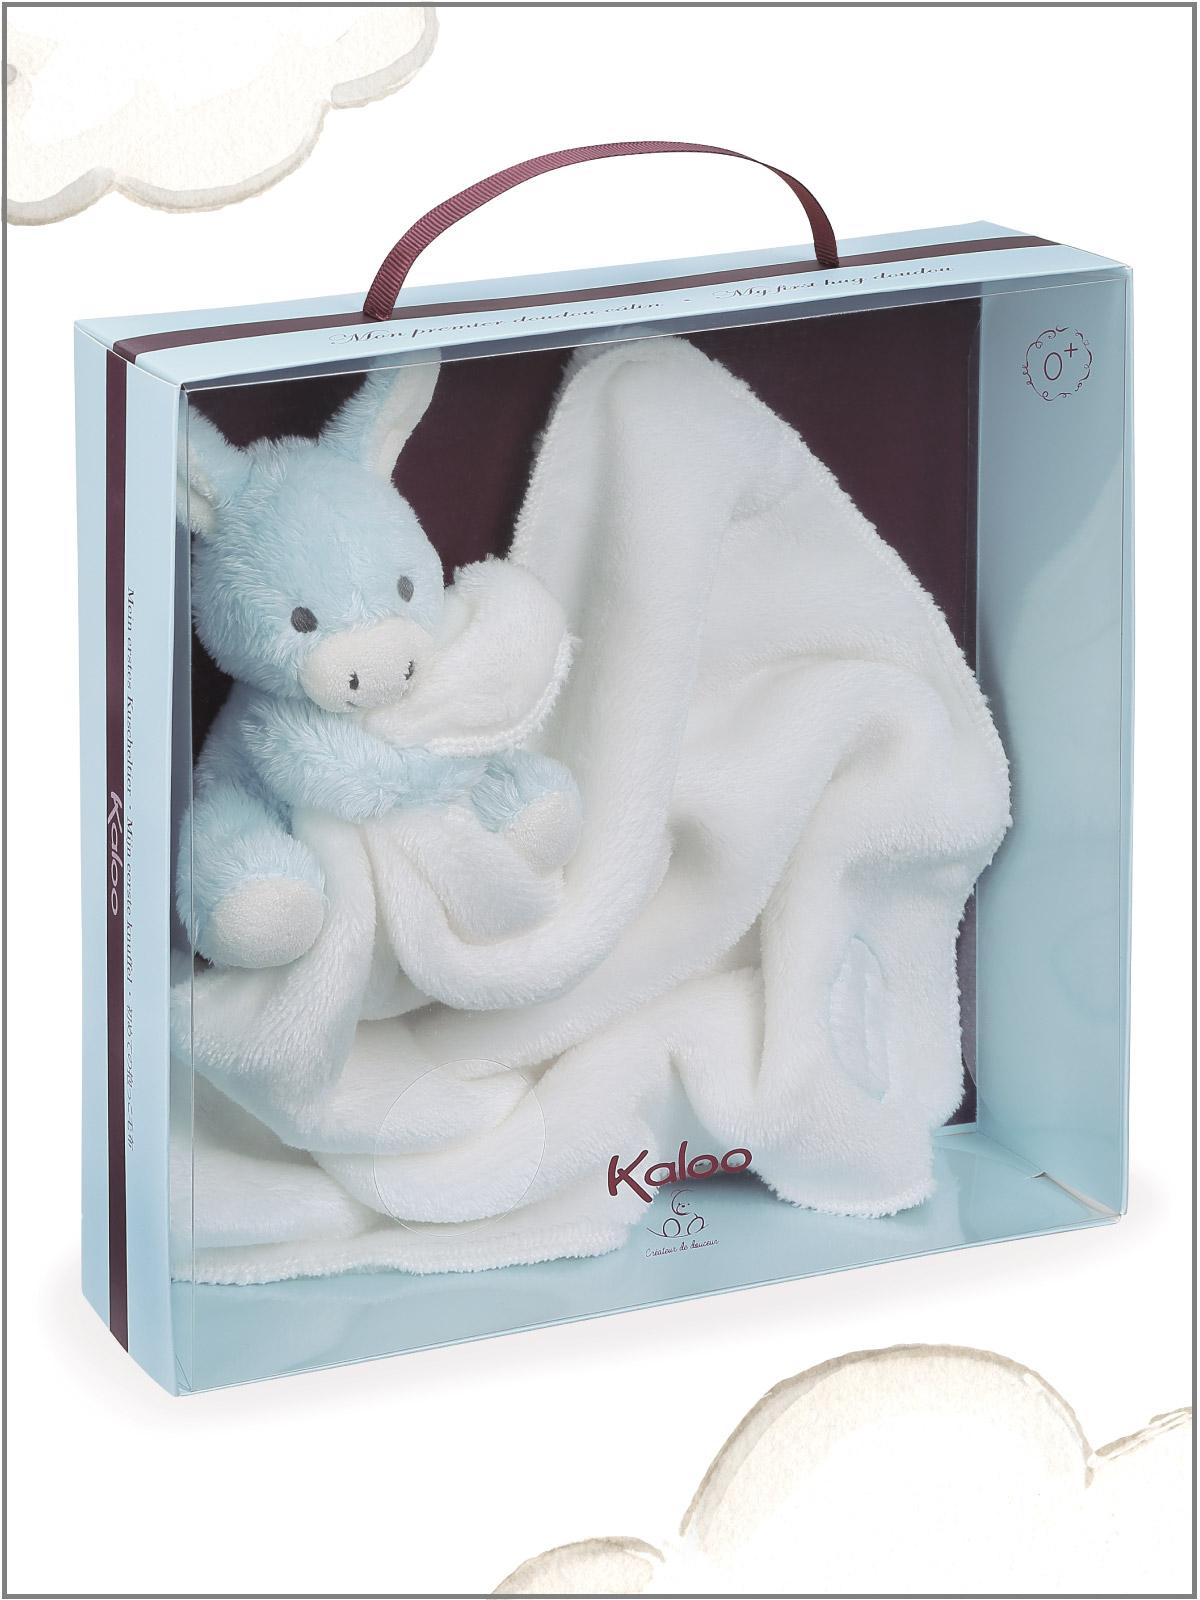 frederickandsophie-kids-toys-kaloo-france-comforter-donkey-amis-blue-doudou